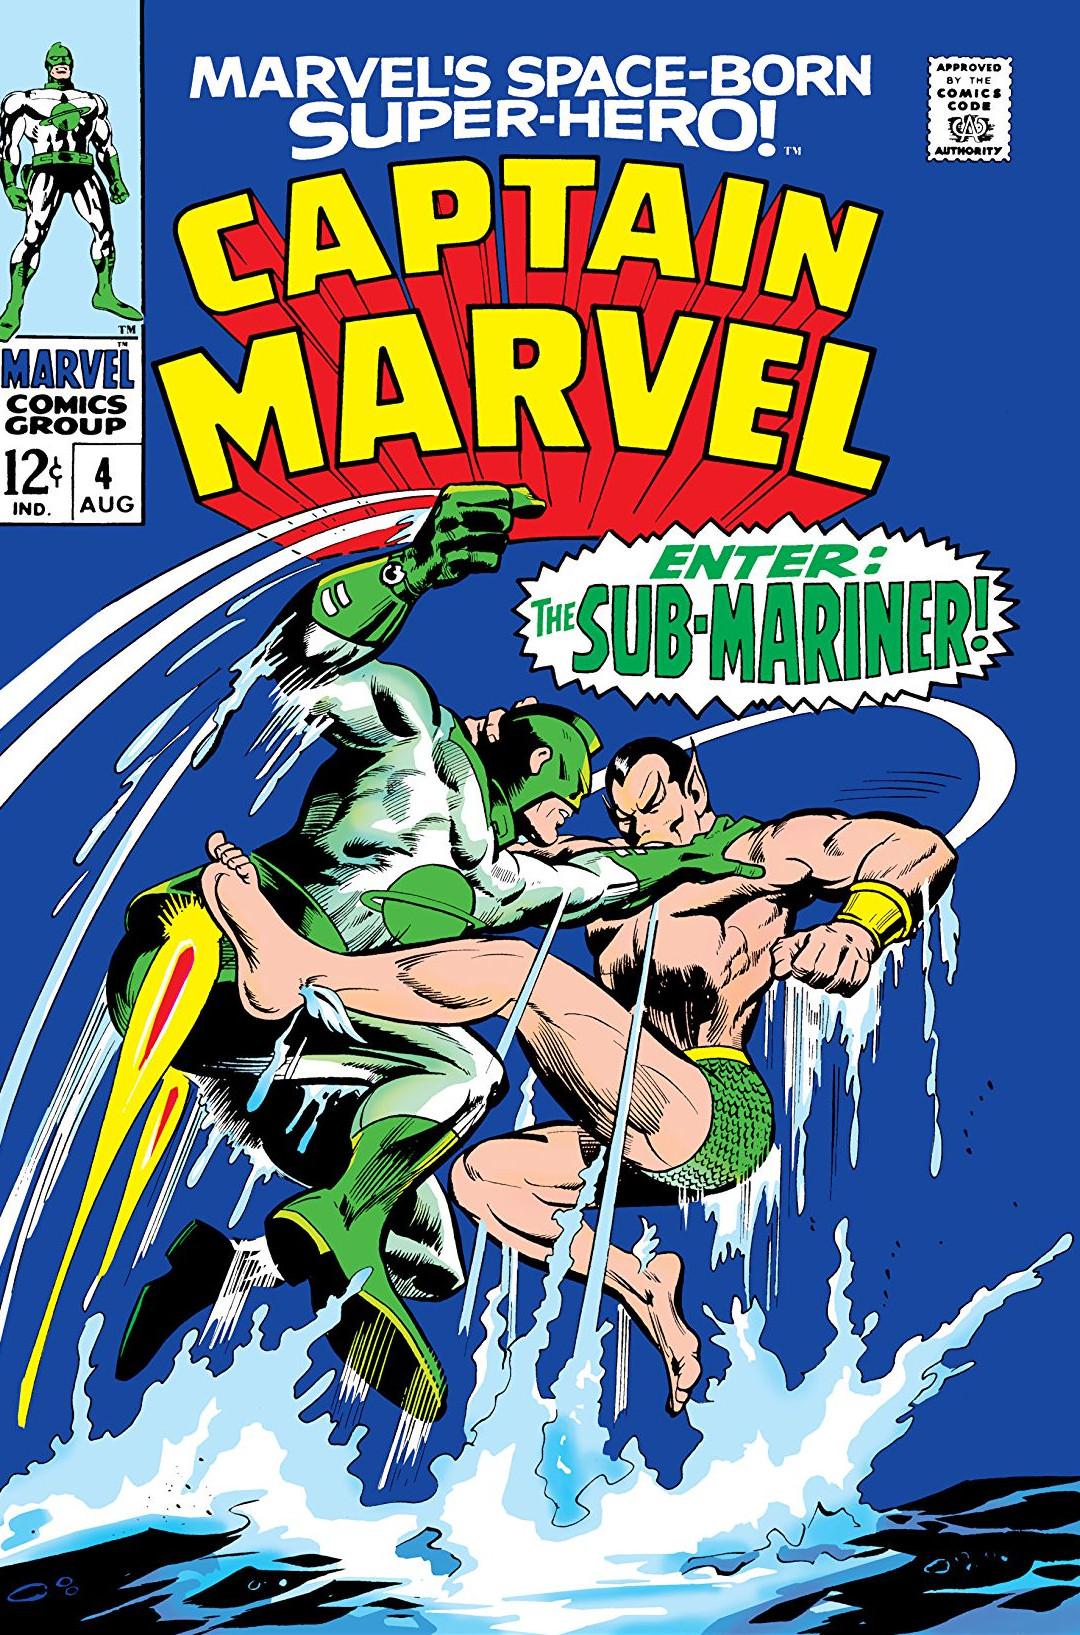 Captain Marvel Vol 1 4